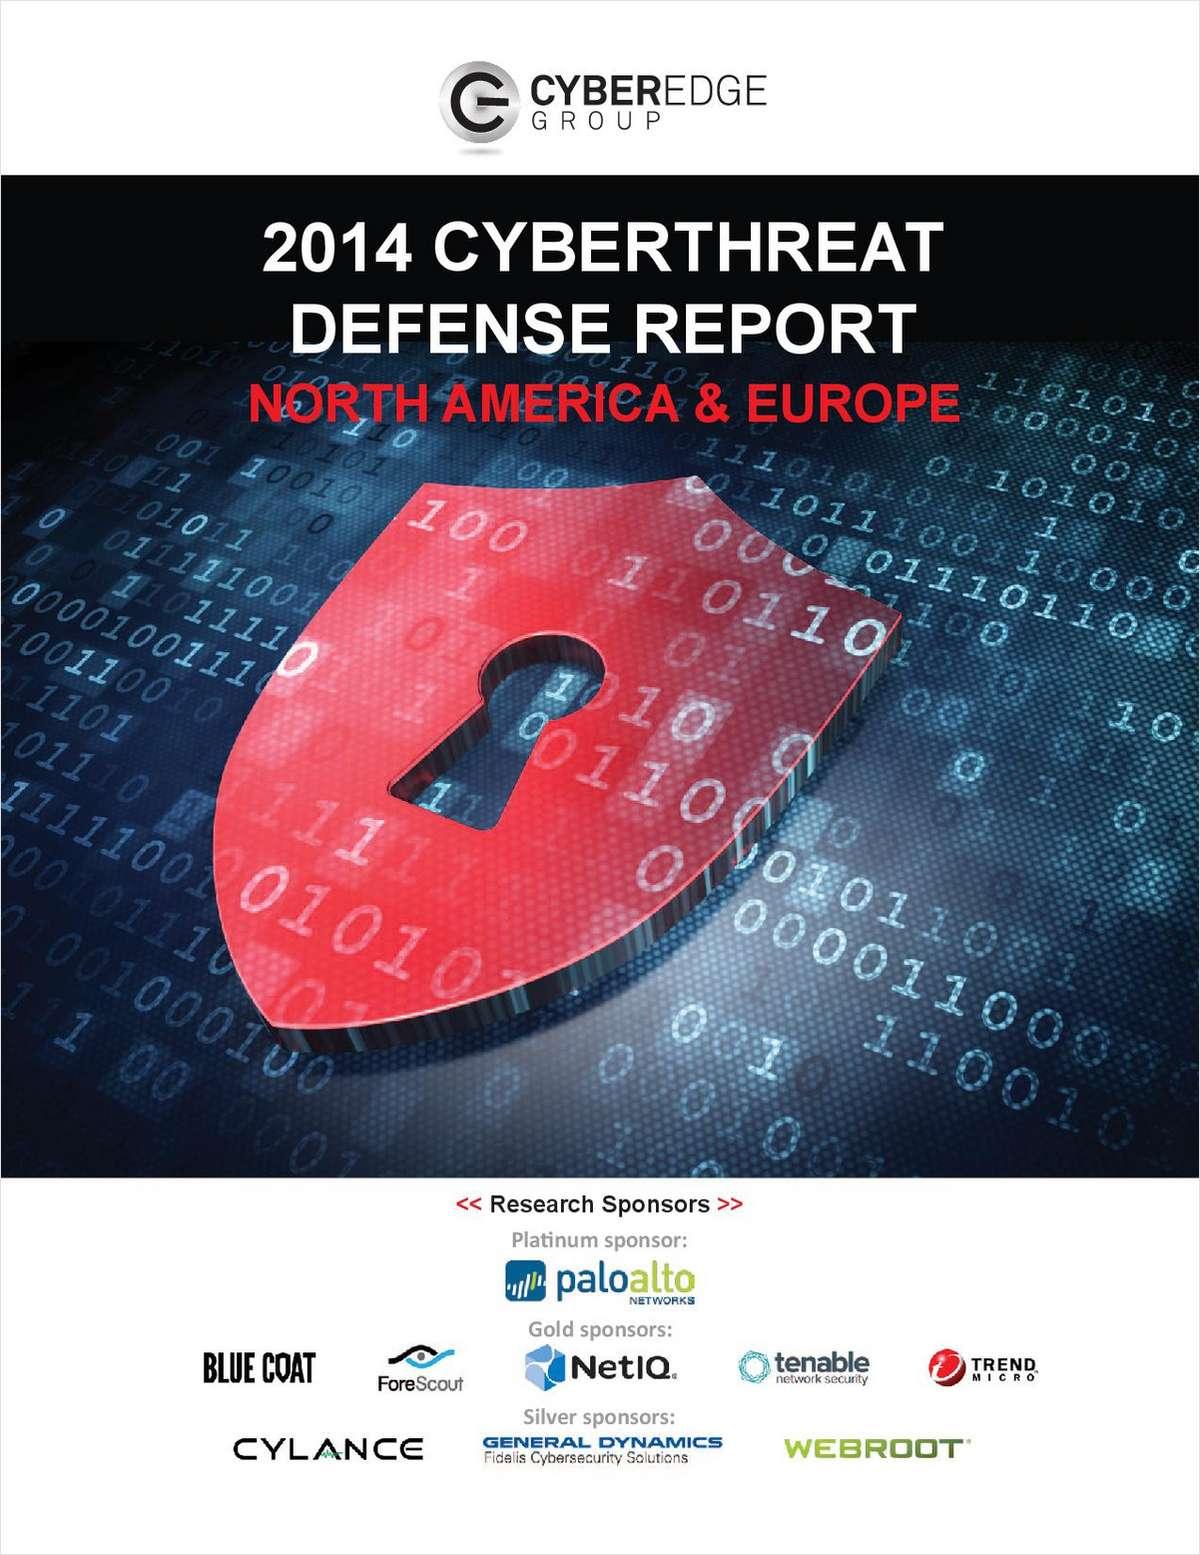 2014 Cyberthreat Defense Report